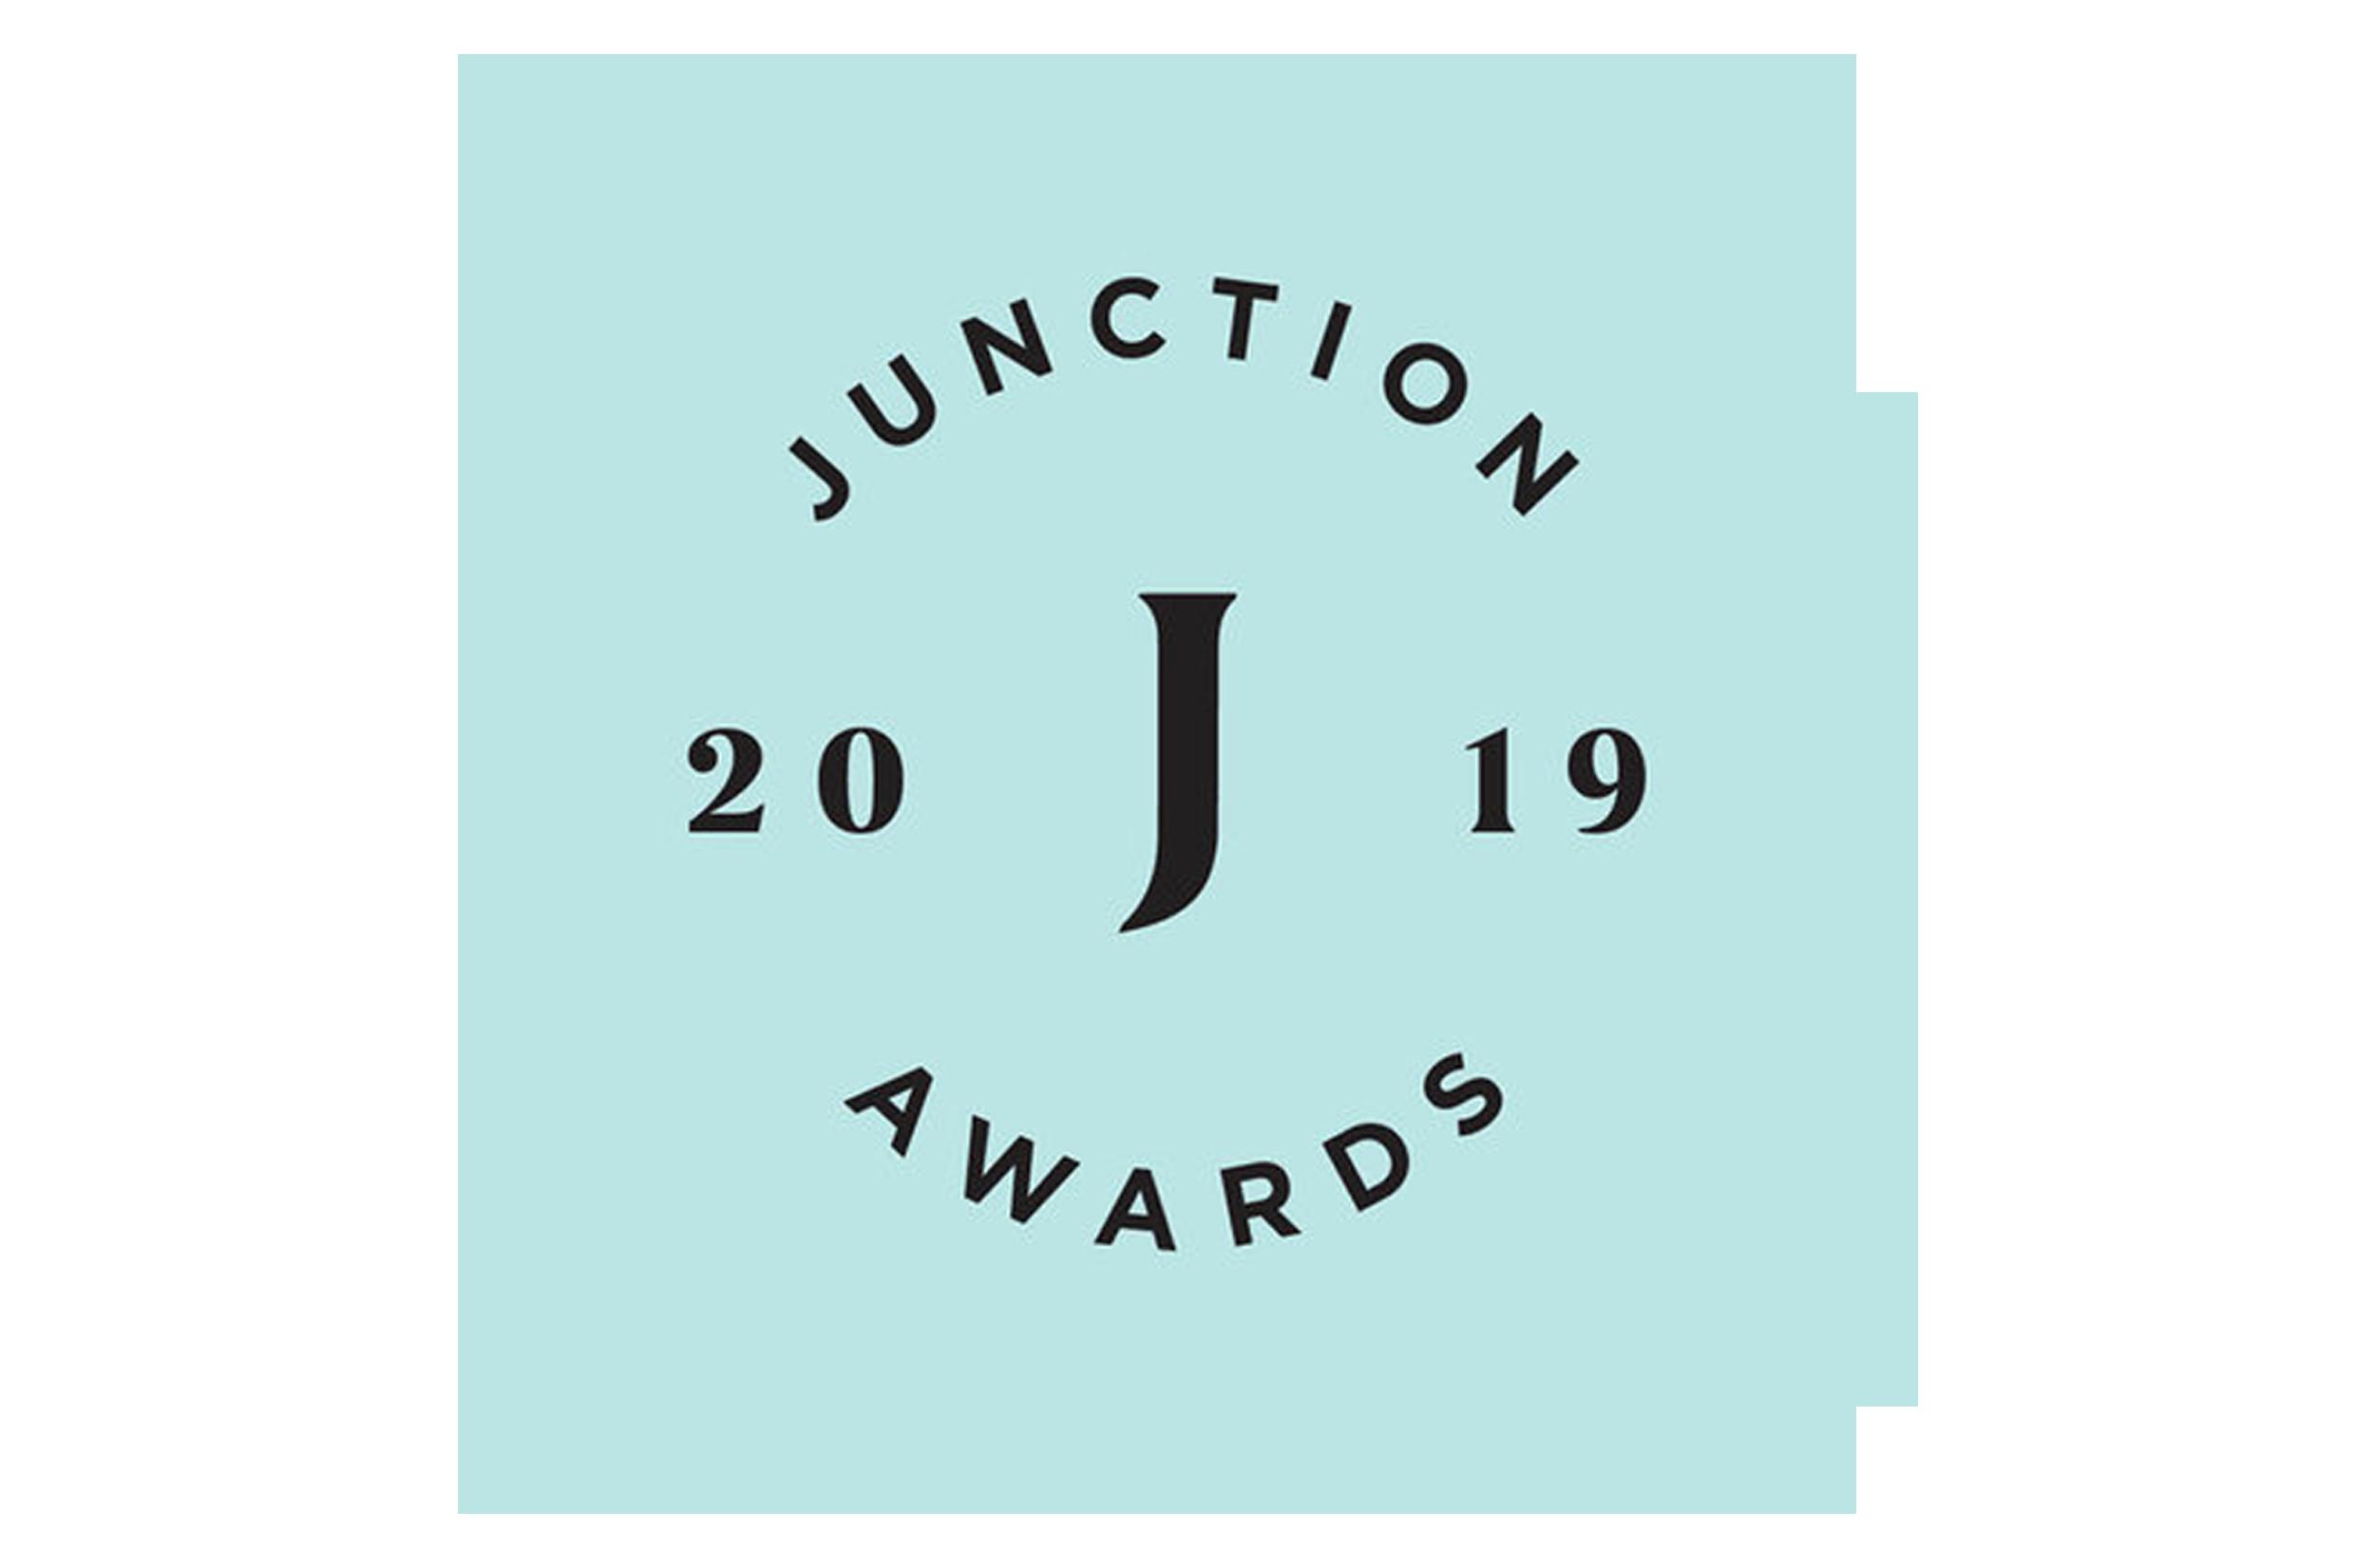 Matakana Boutique Pharmacy - Junction Award 1st Place Winner 2019 Health & Beauty Category